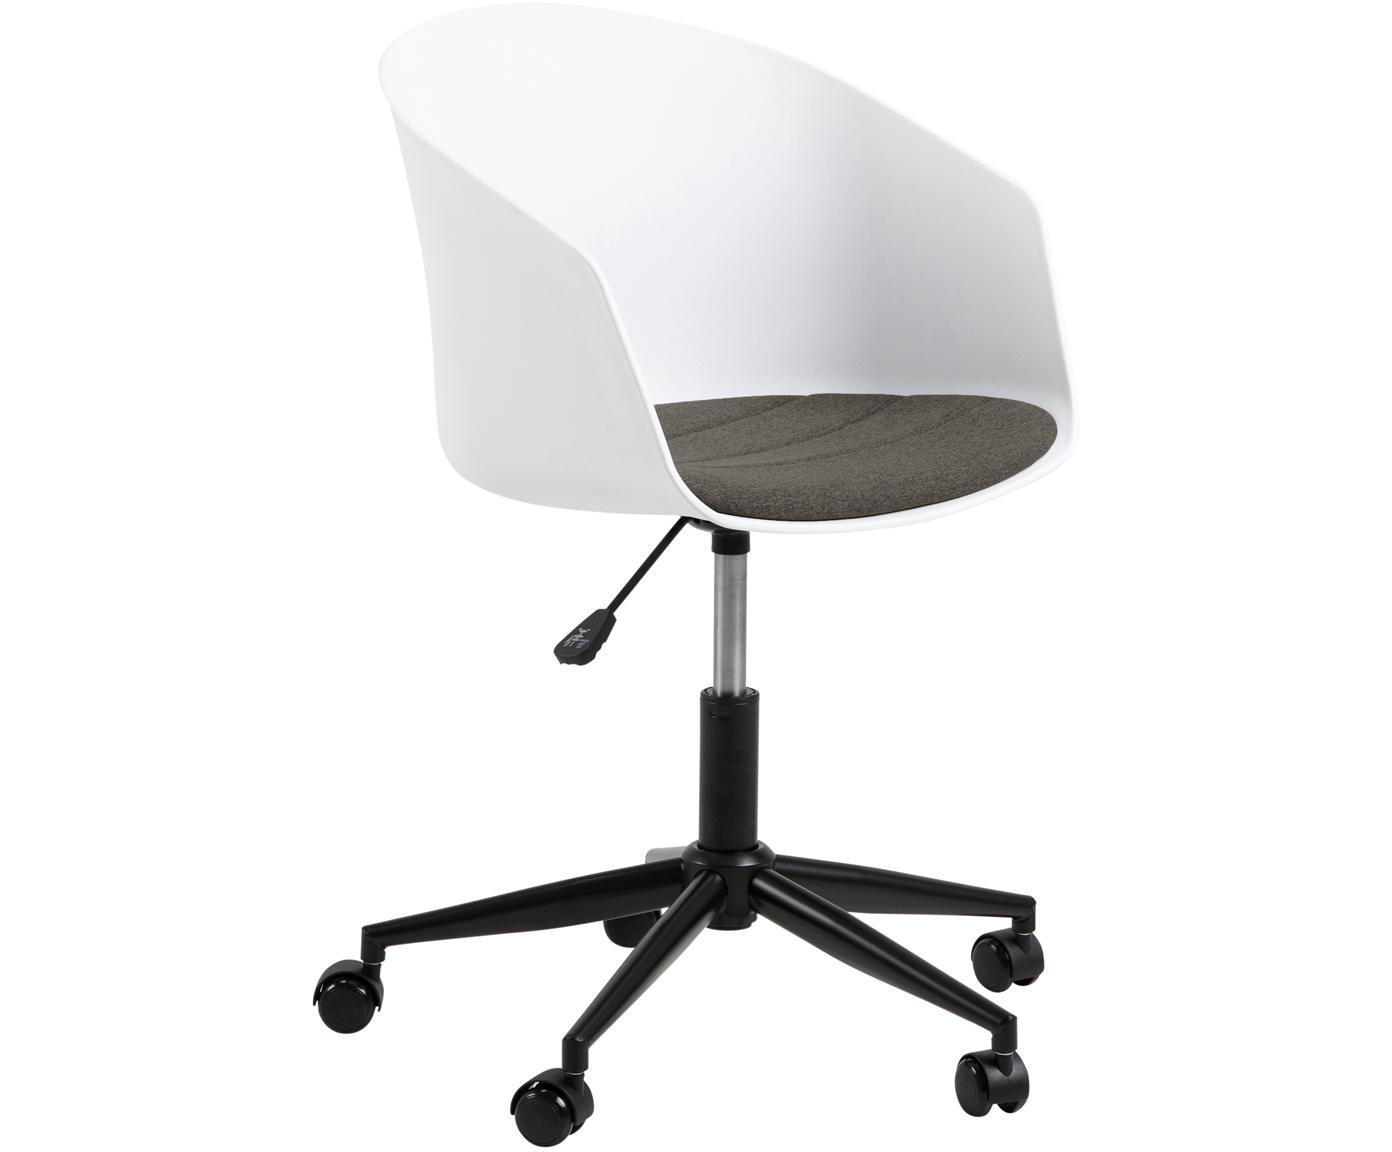 Sedia da ufficio Moon, Polipropilene, tessuto, metallo, Bianco, grigio scuro, nero, Larg. 65 x Prof. 65 cm